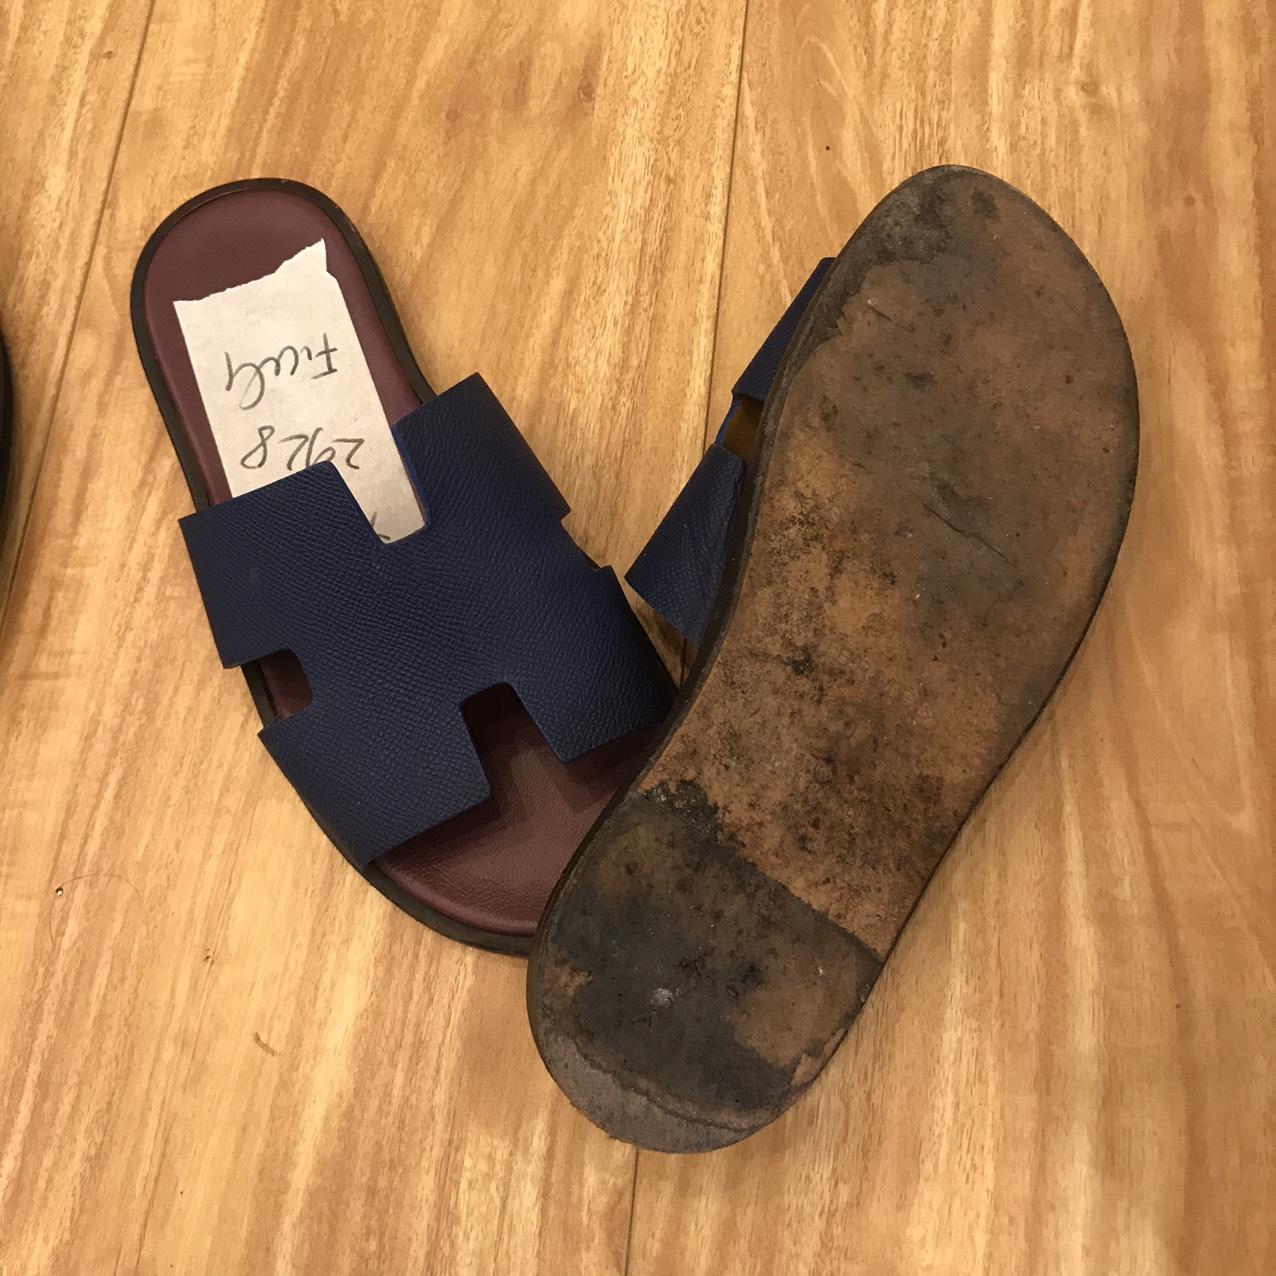 Sửa Chữa Giày Dép Gucci, Chanel, Louis Vuitton, Hermes ... 17